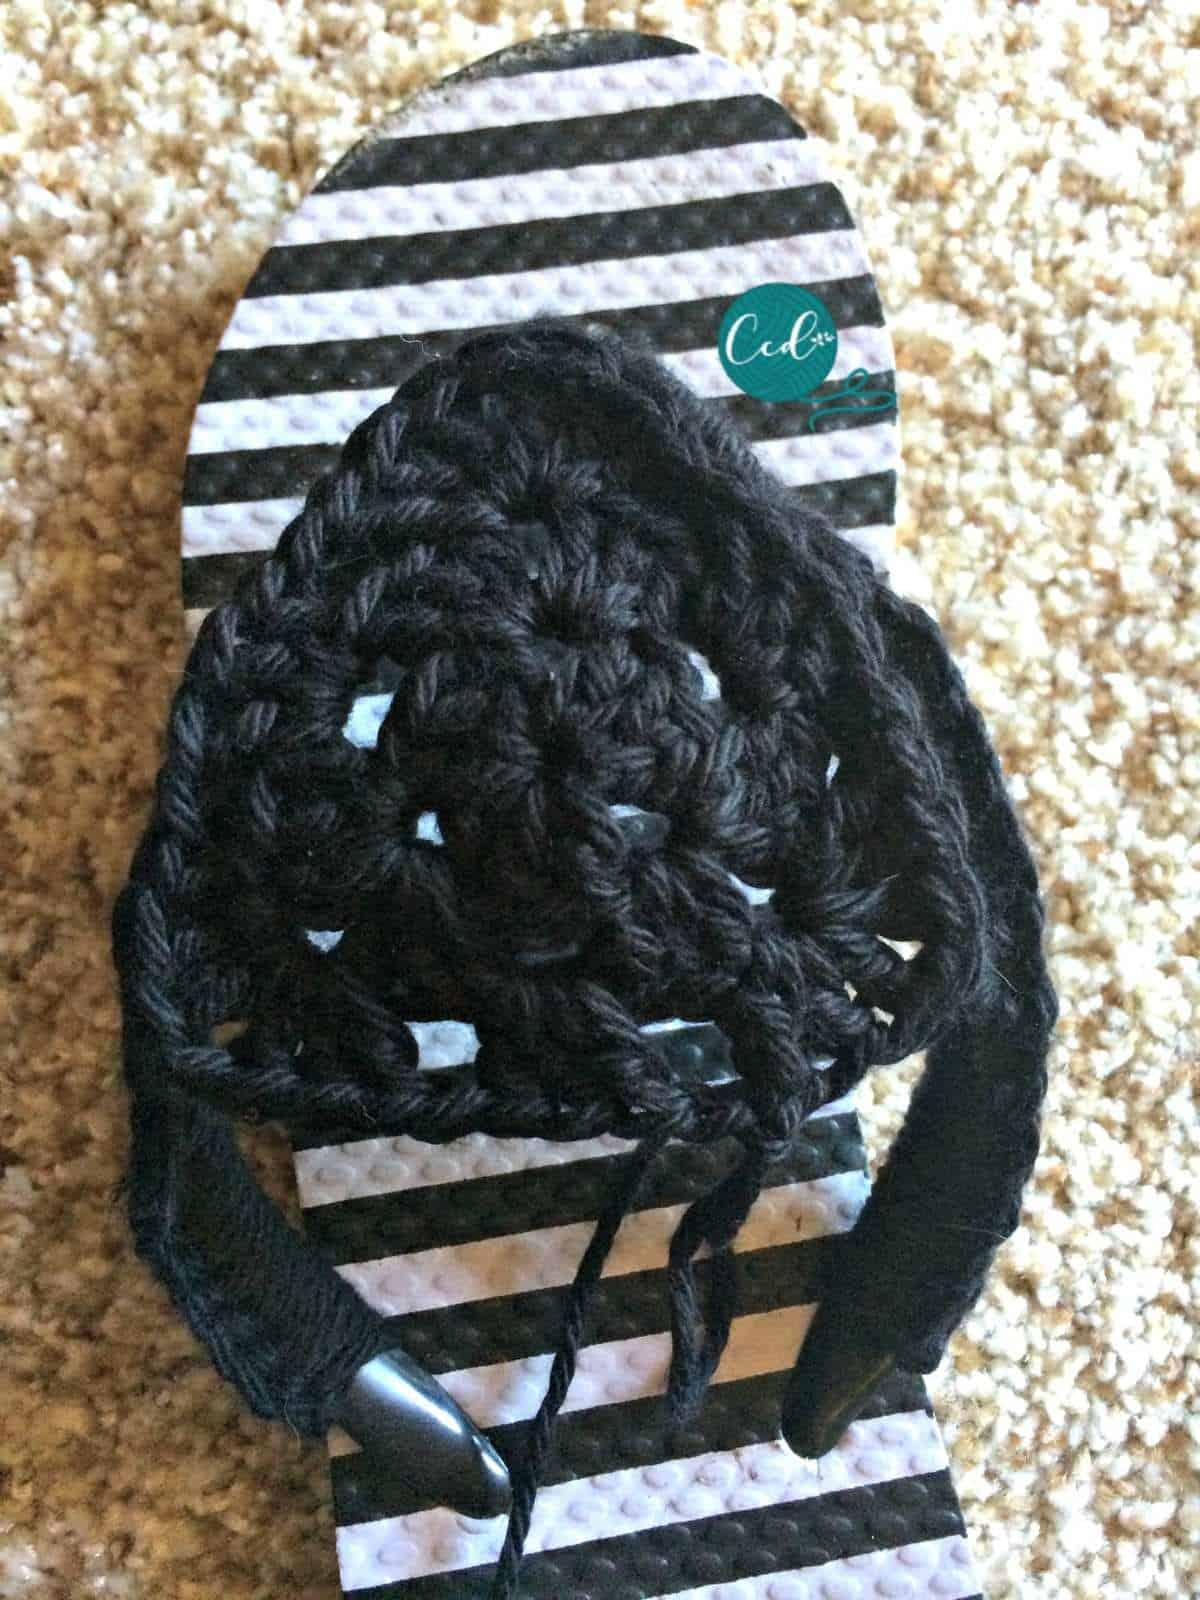 Crochet sandals with granny black.